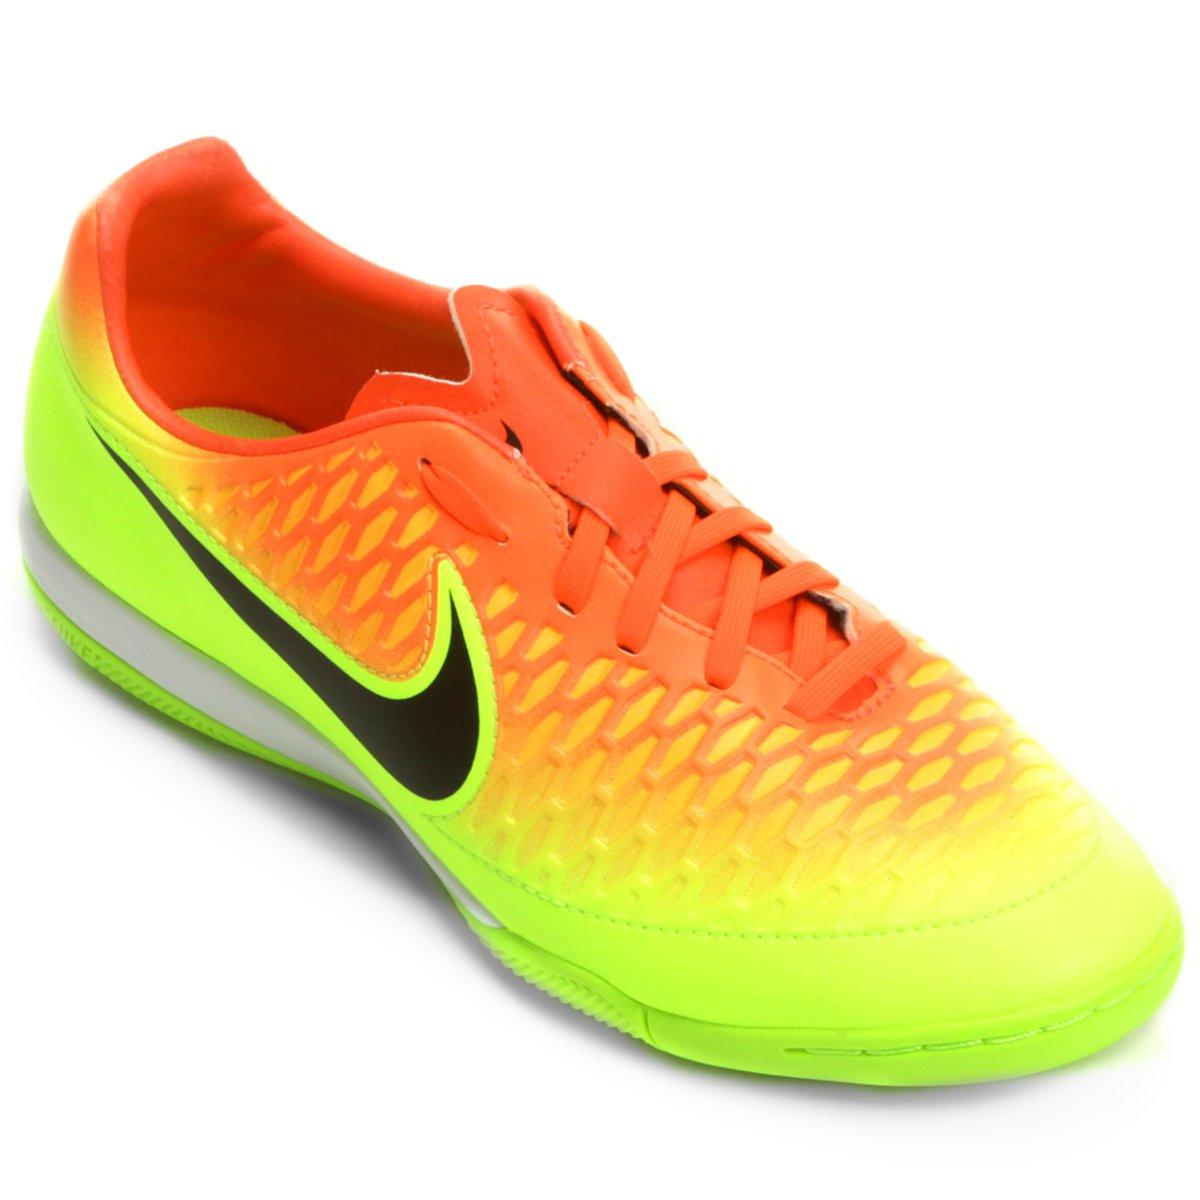 Chuteira Nike Magista Onda IC Futsal - Compre Agora  638175ec5f586